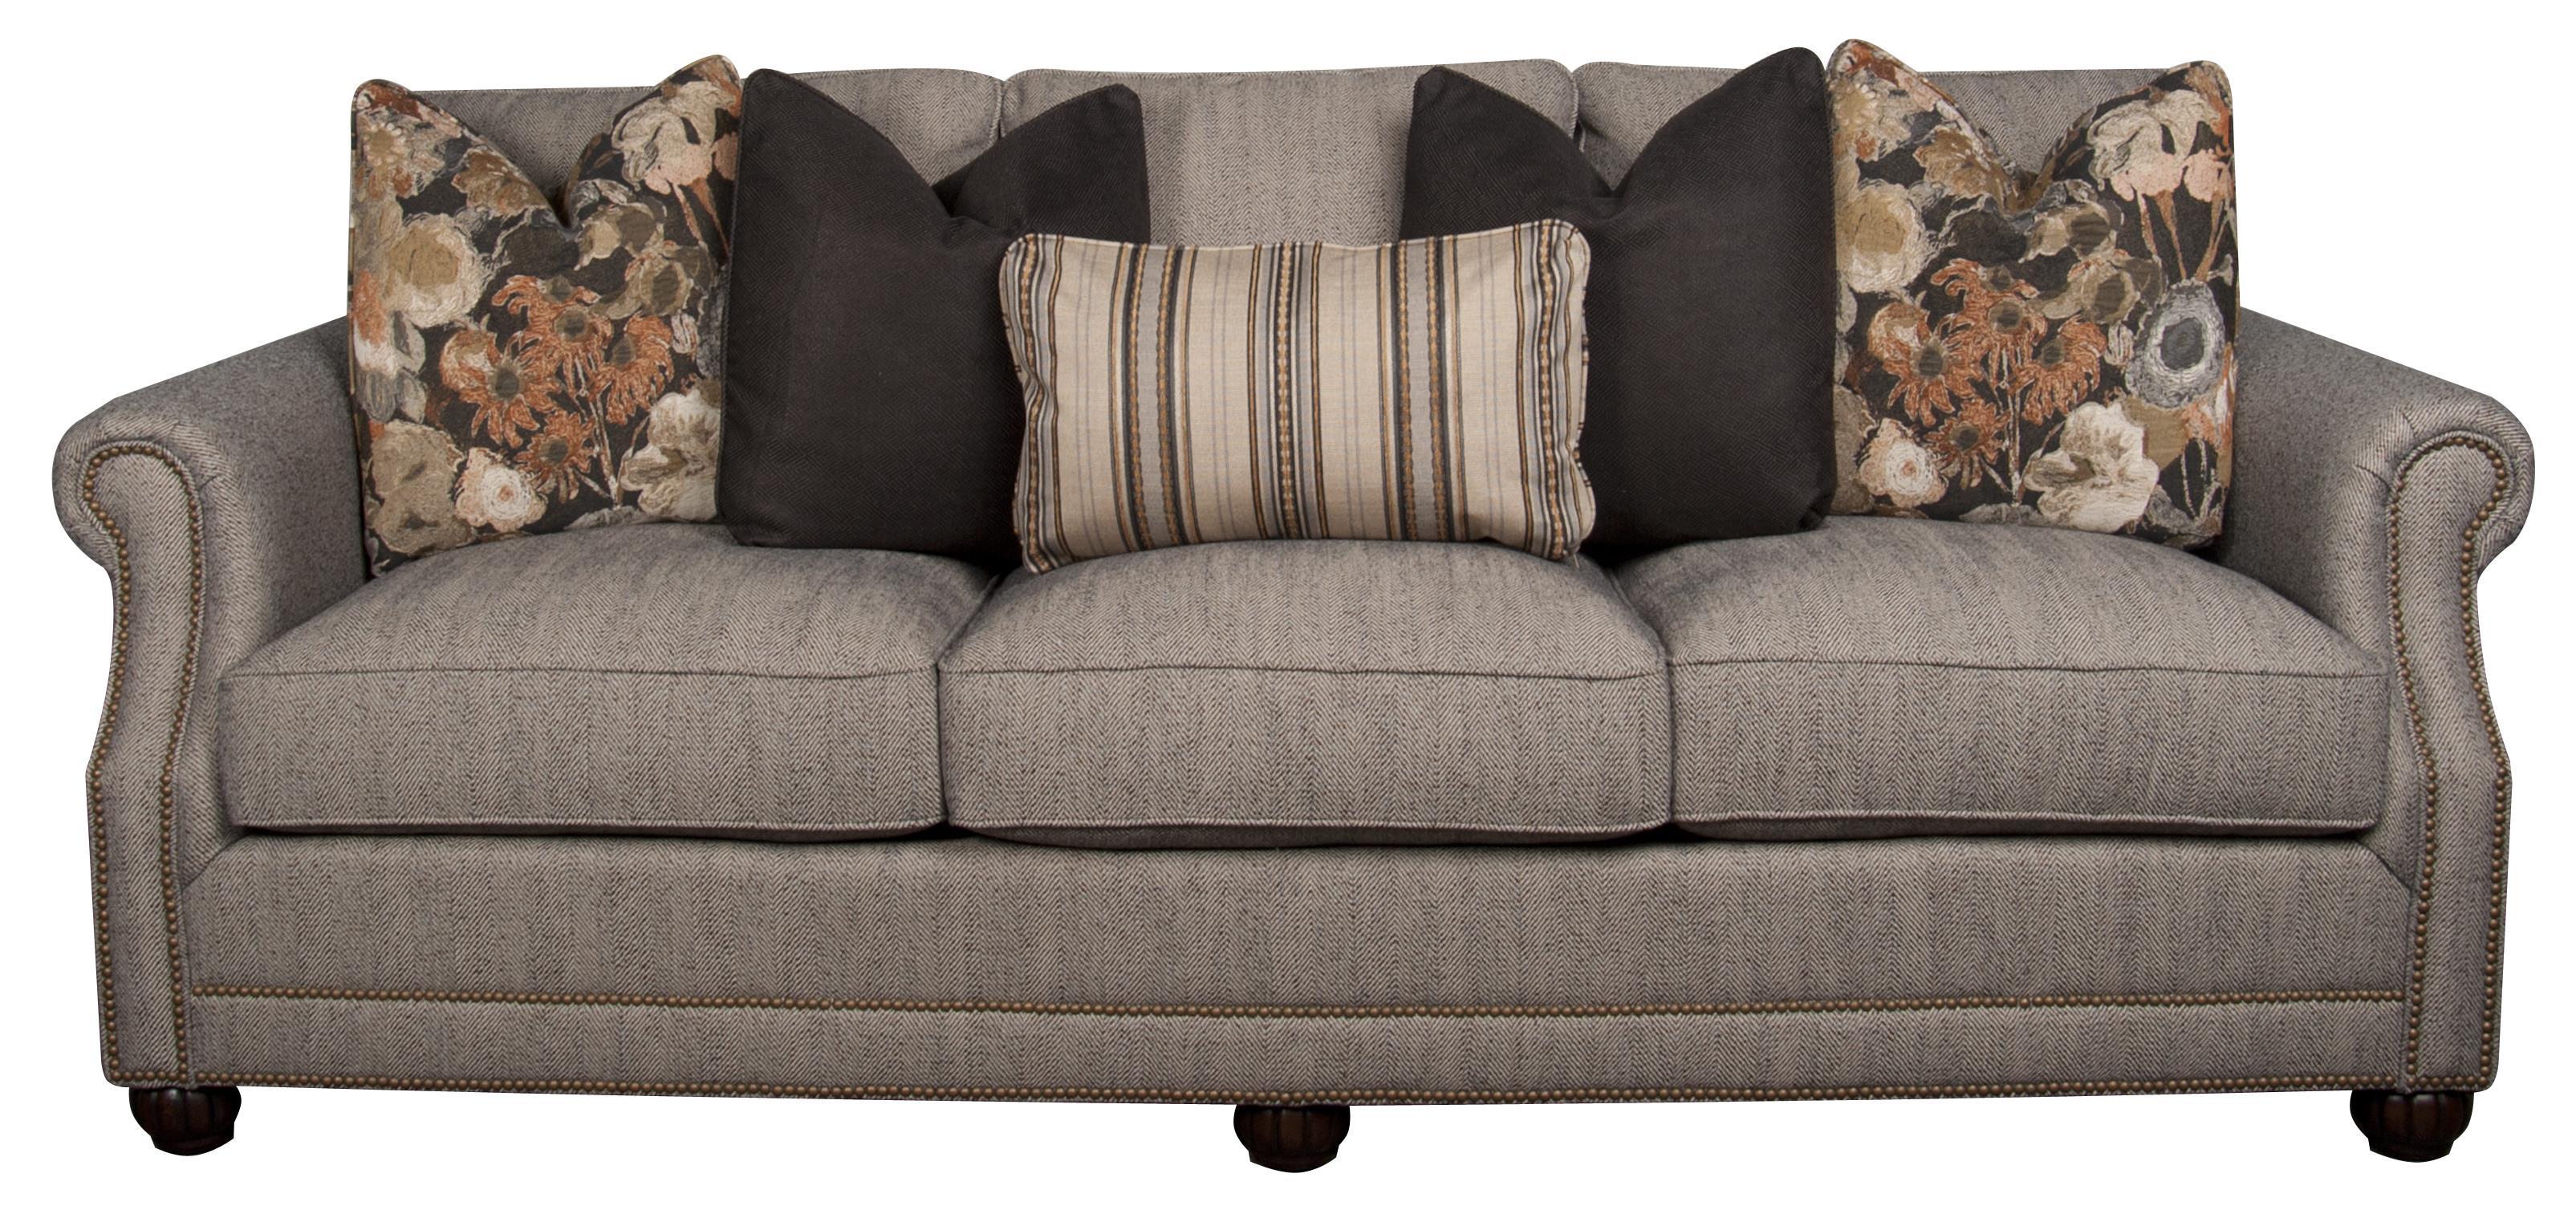 Morris Home Sherry Sherry Sofa - Item Number: 251852188